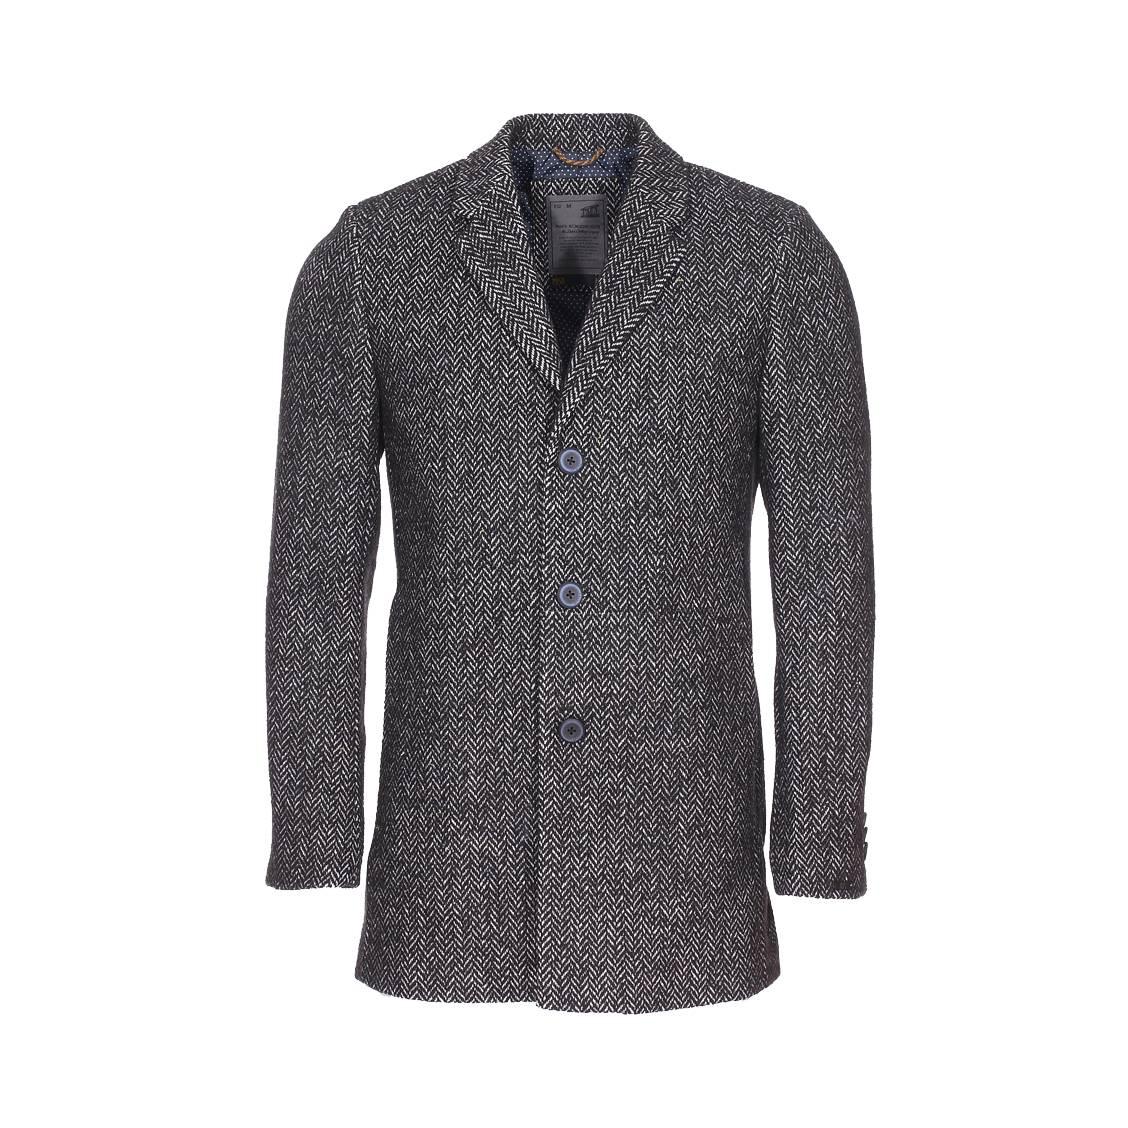 No excess - manteau, caban, duffle coat